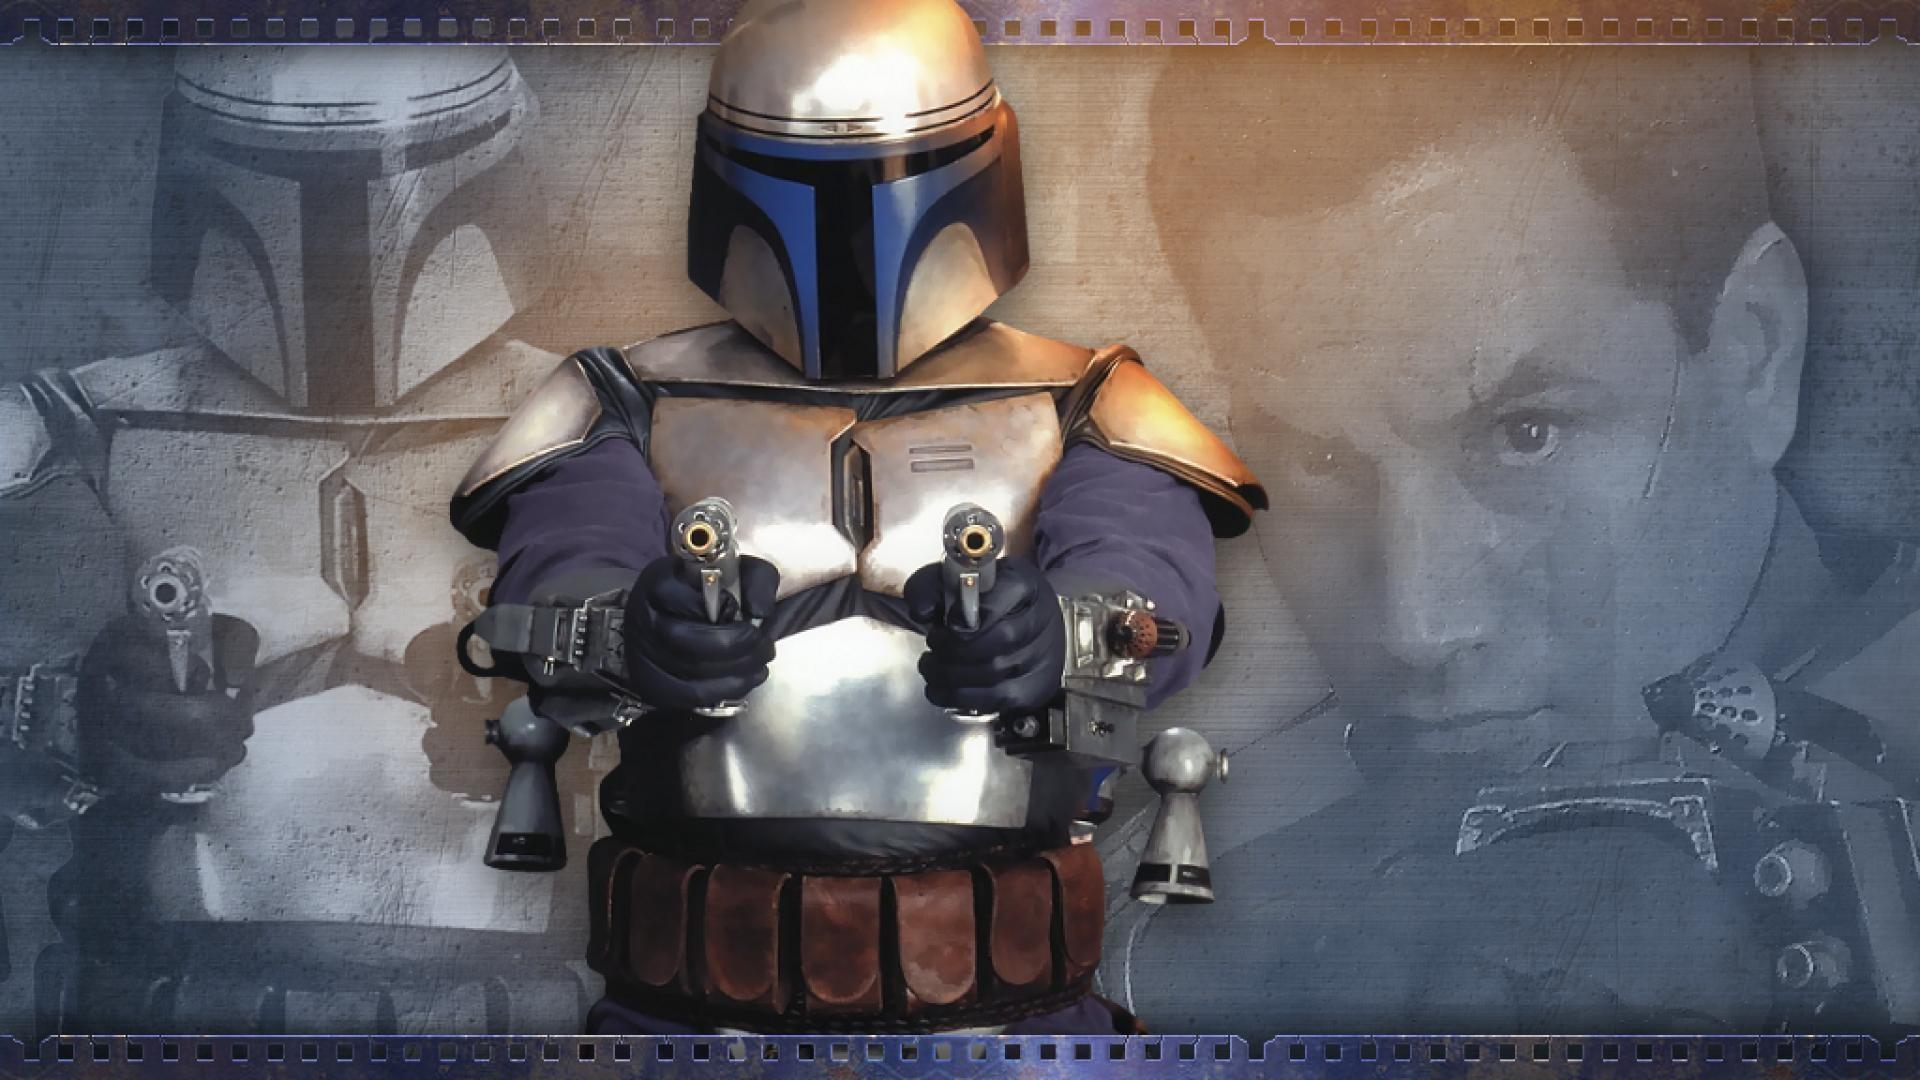 Star Wars Jango Fett Wallpaper